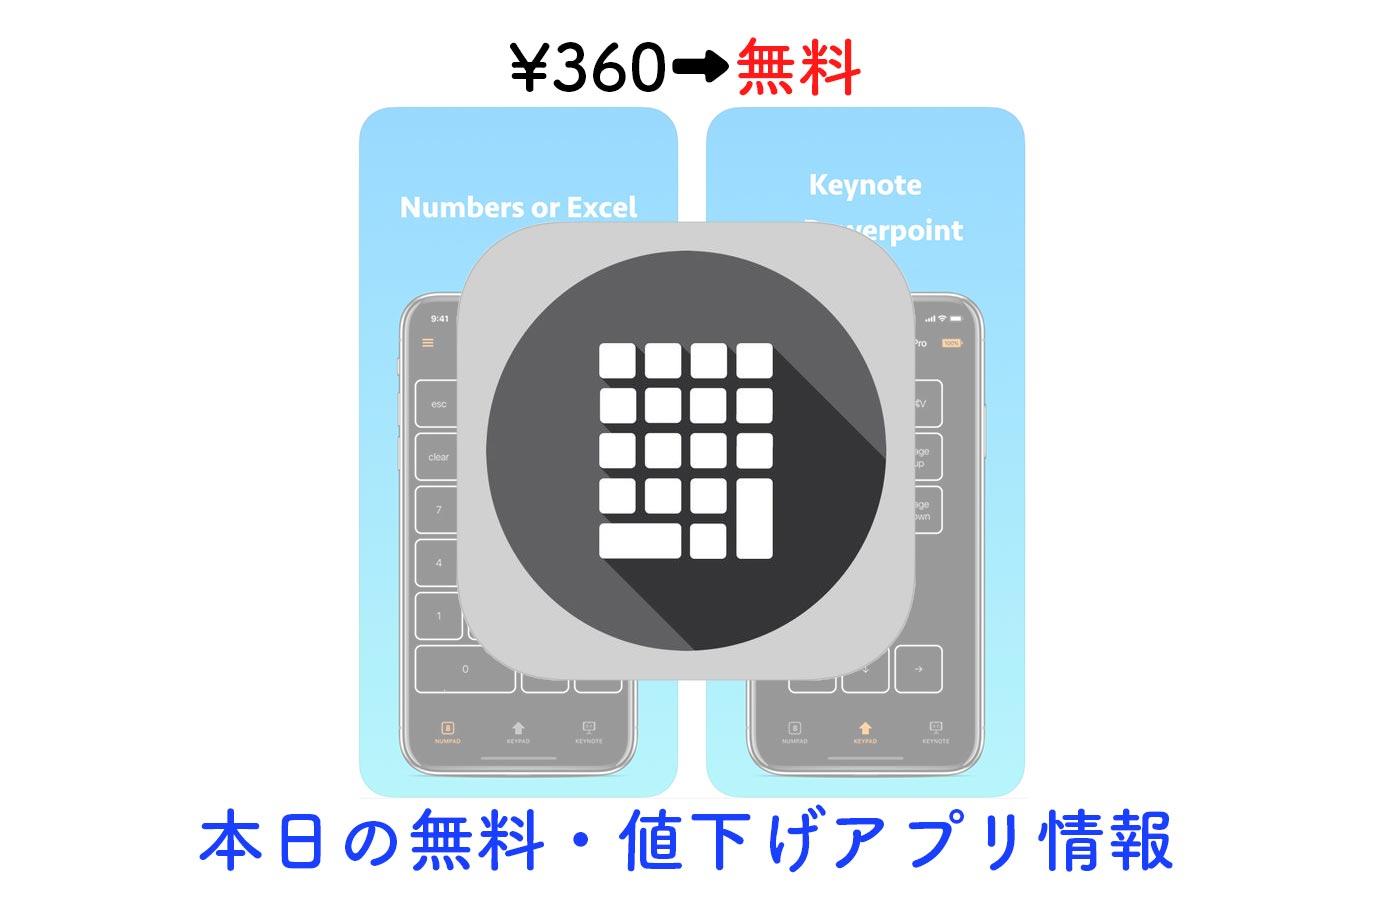 Appsale0503